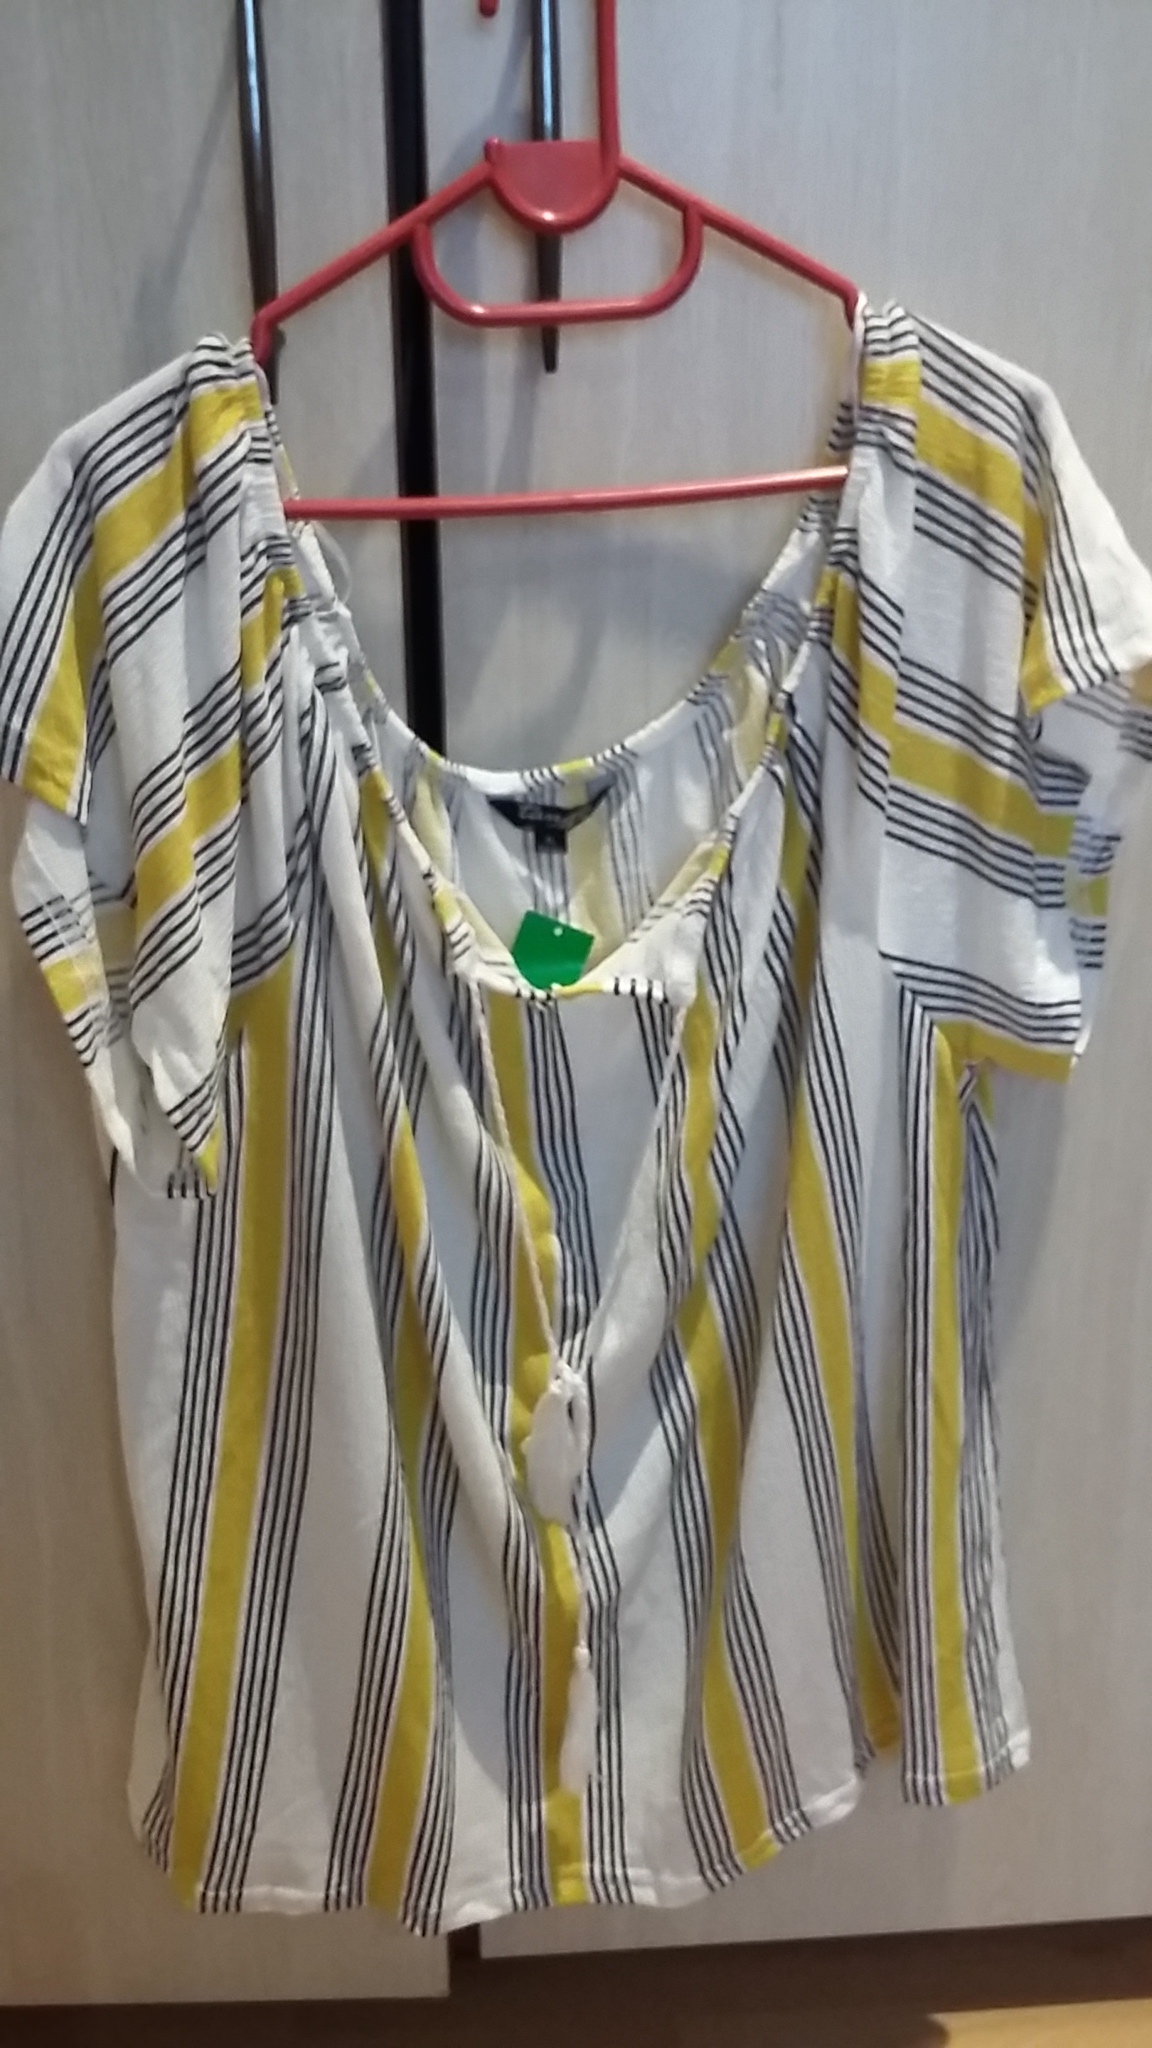 Ladies new tops for sale Kempton Park.